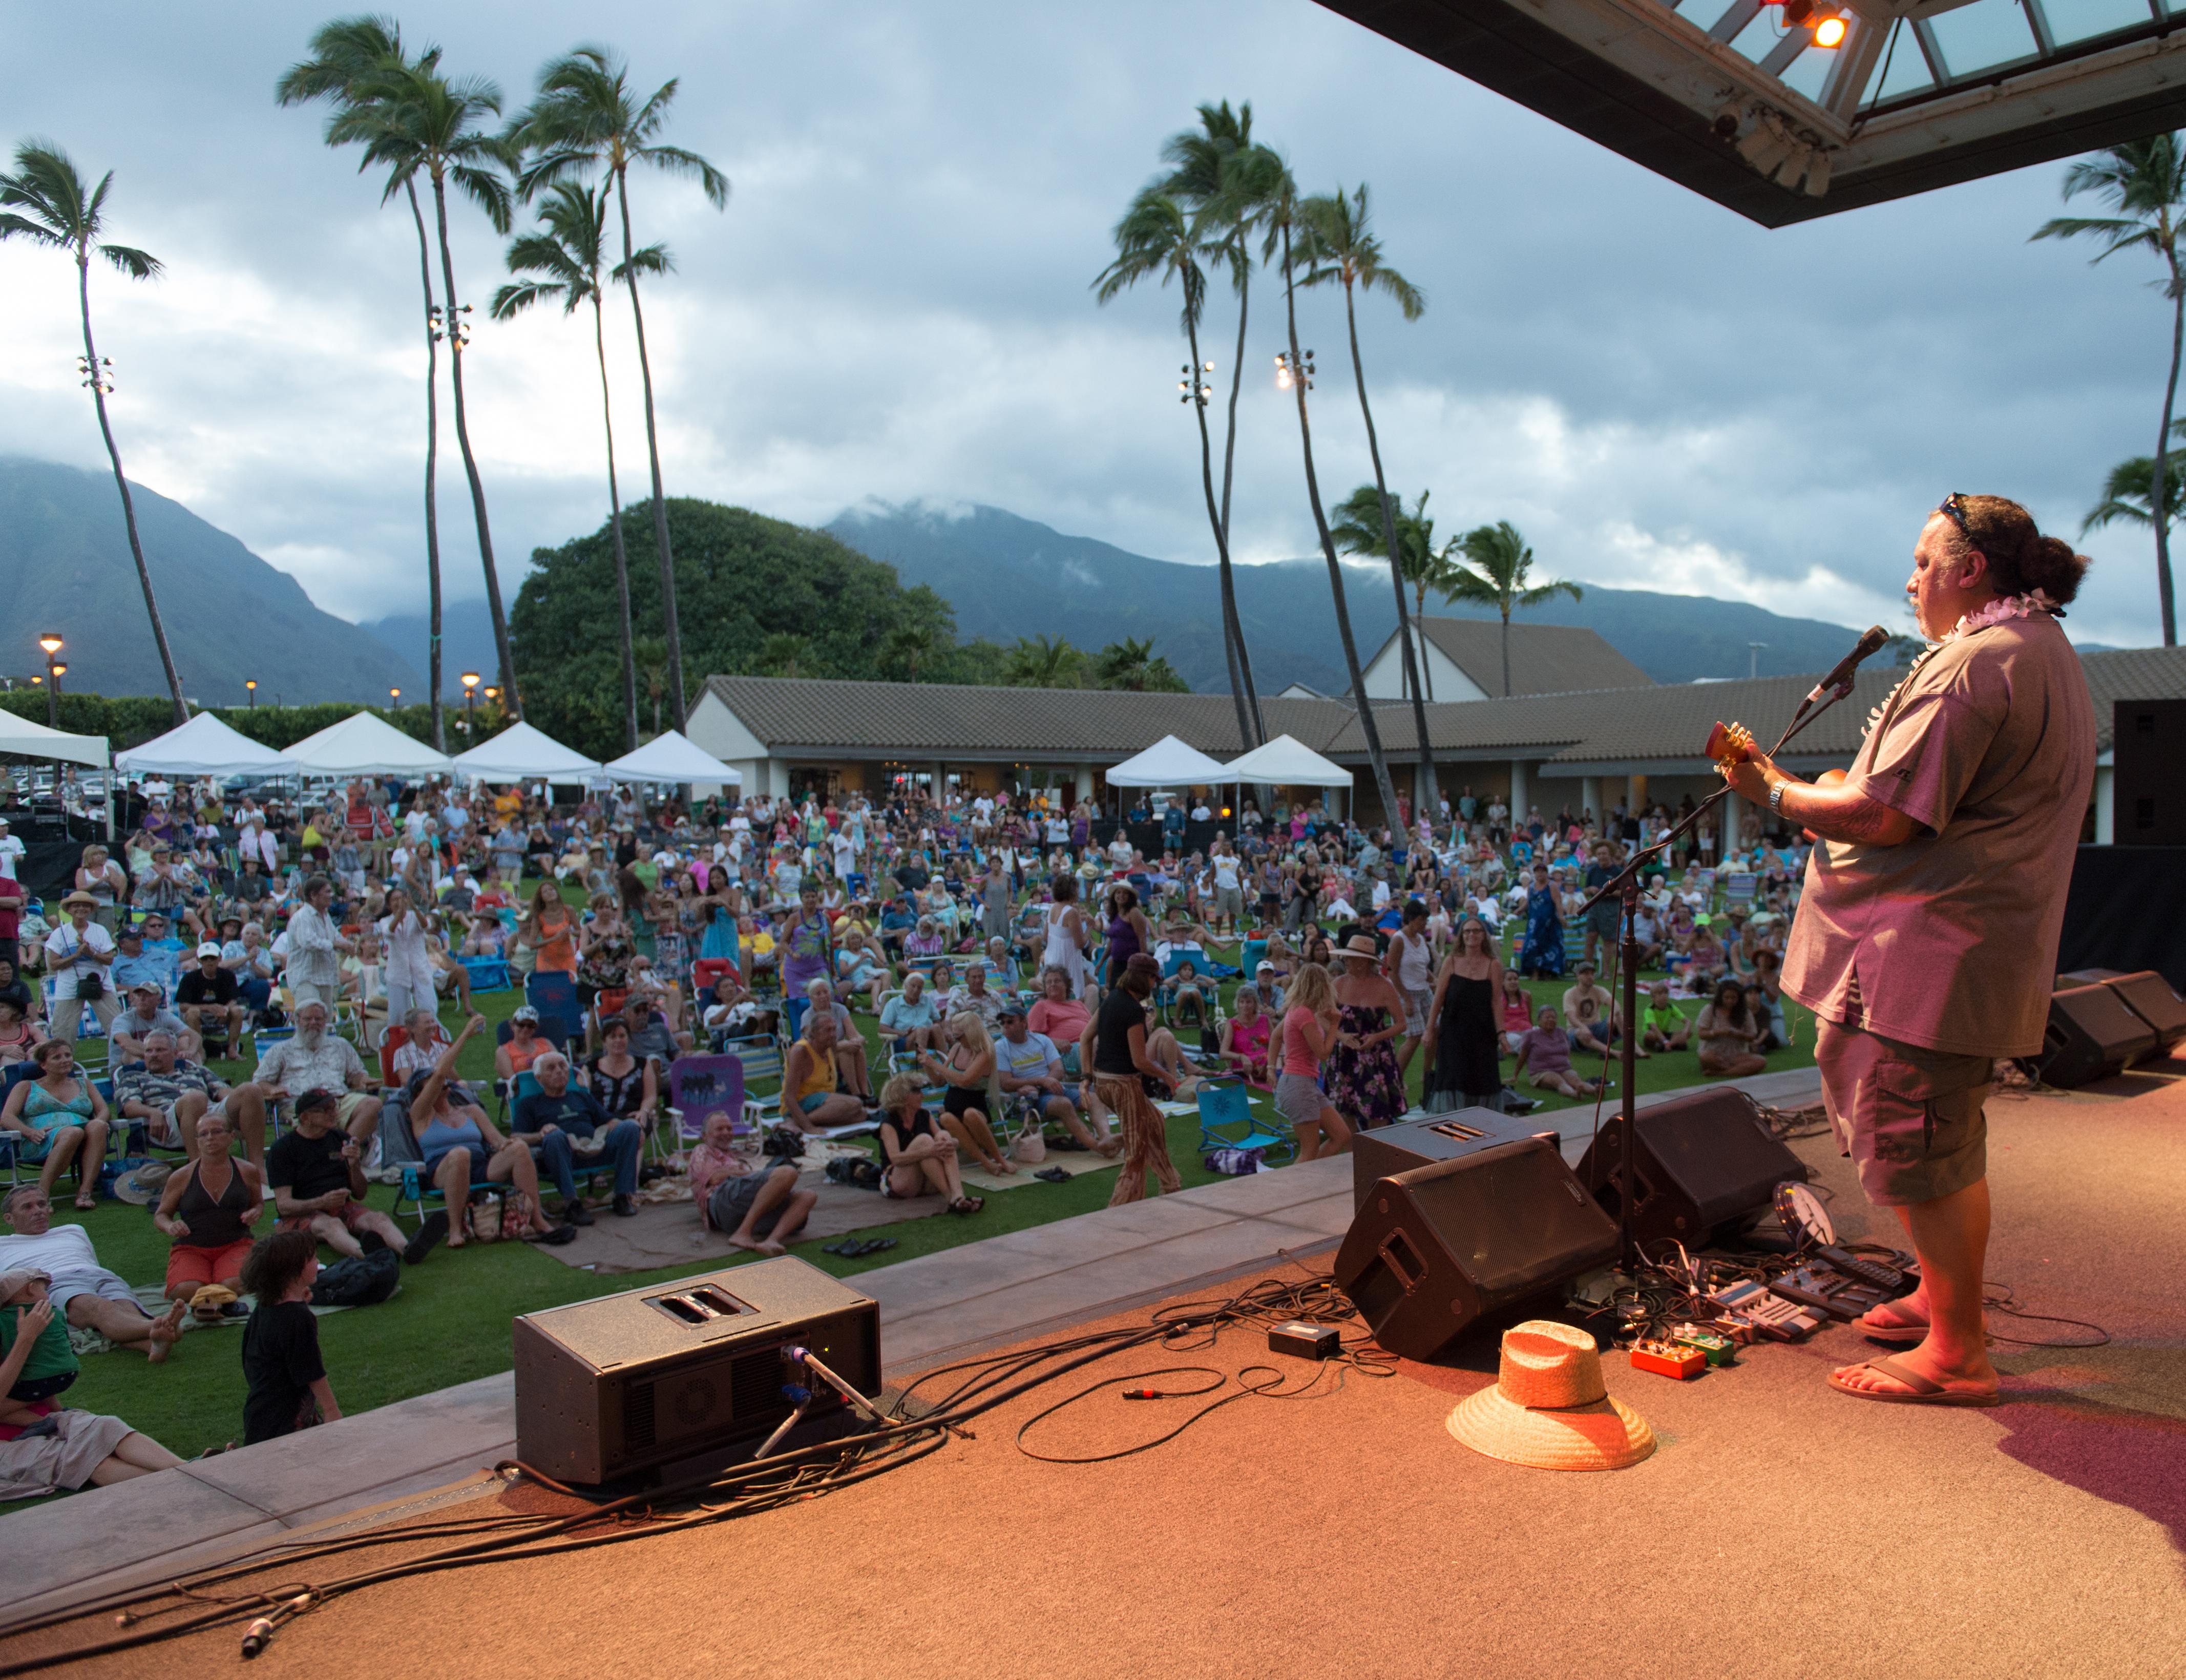 11th Annual Maui 'Ukulele Festival. Willie K, photo credit Aubrey Hord Photography.